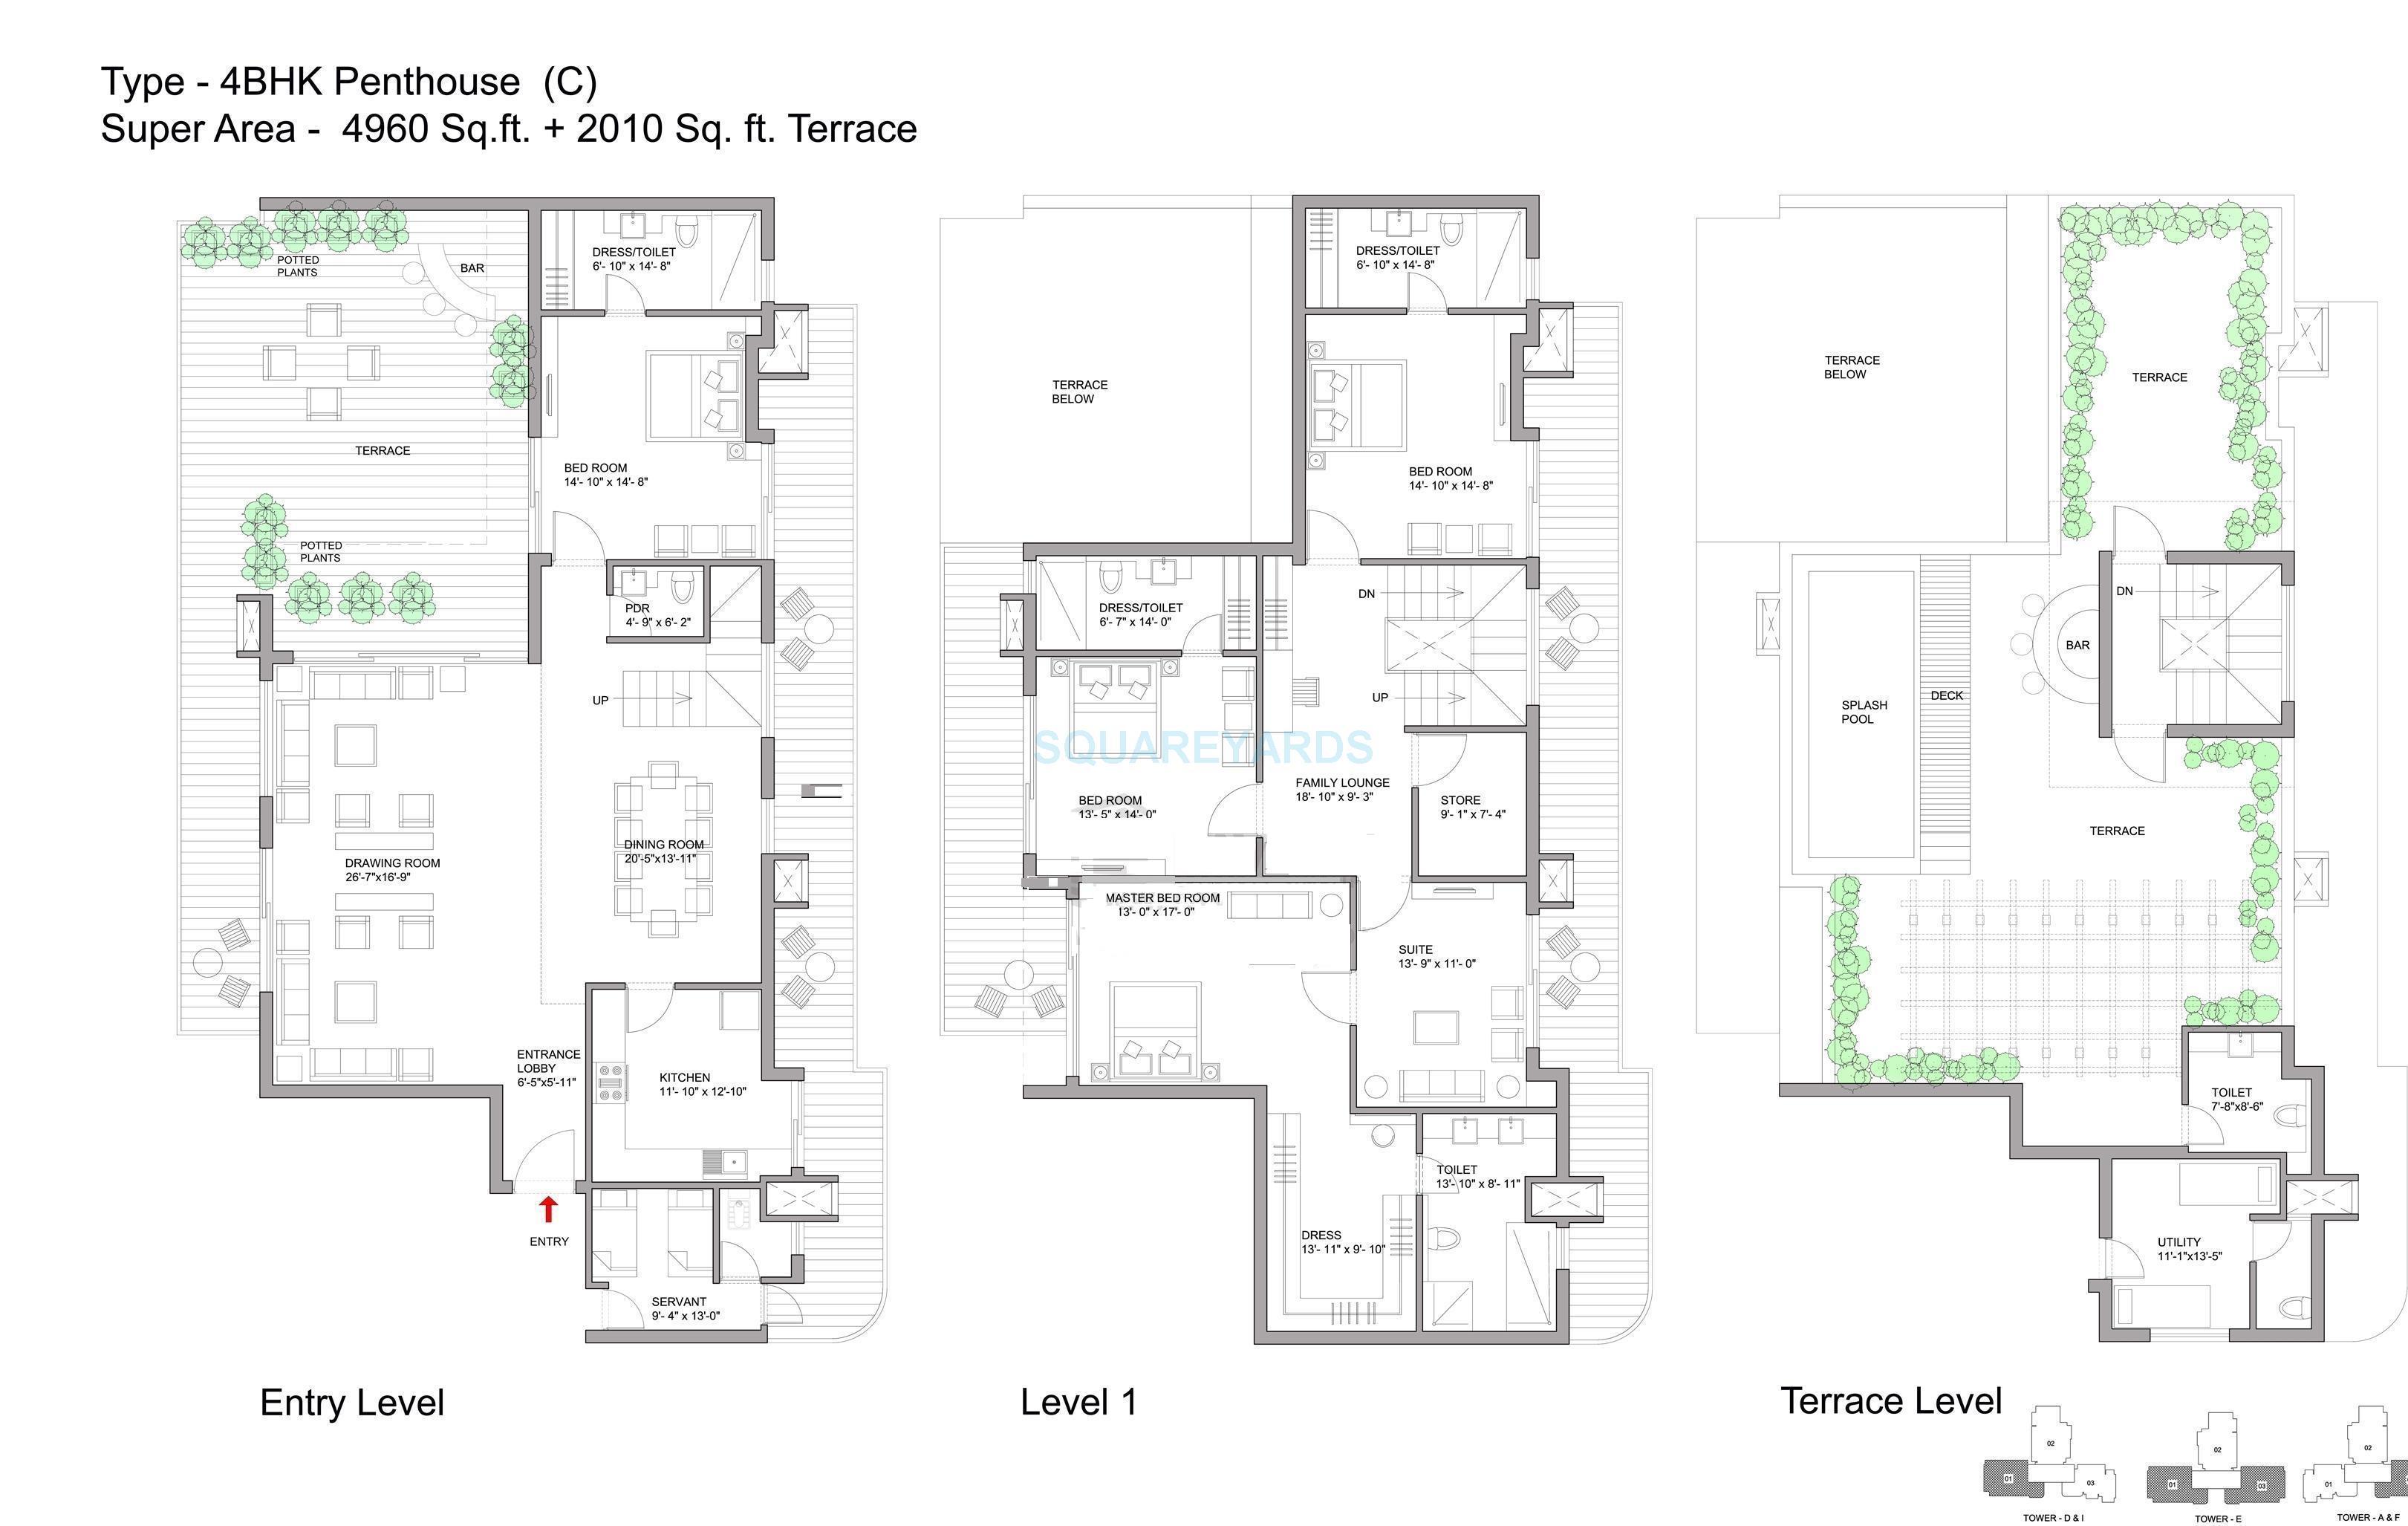 bestech park view grand spa apartments penthouse 4bhk 4960sqft 1